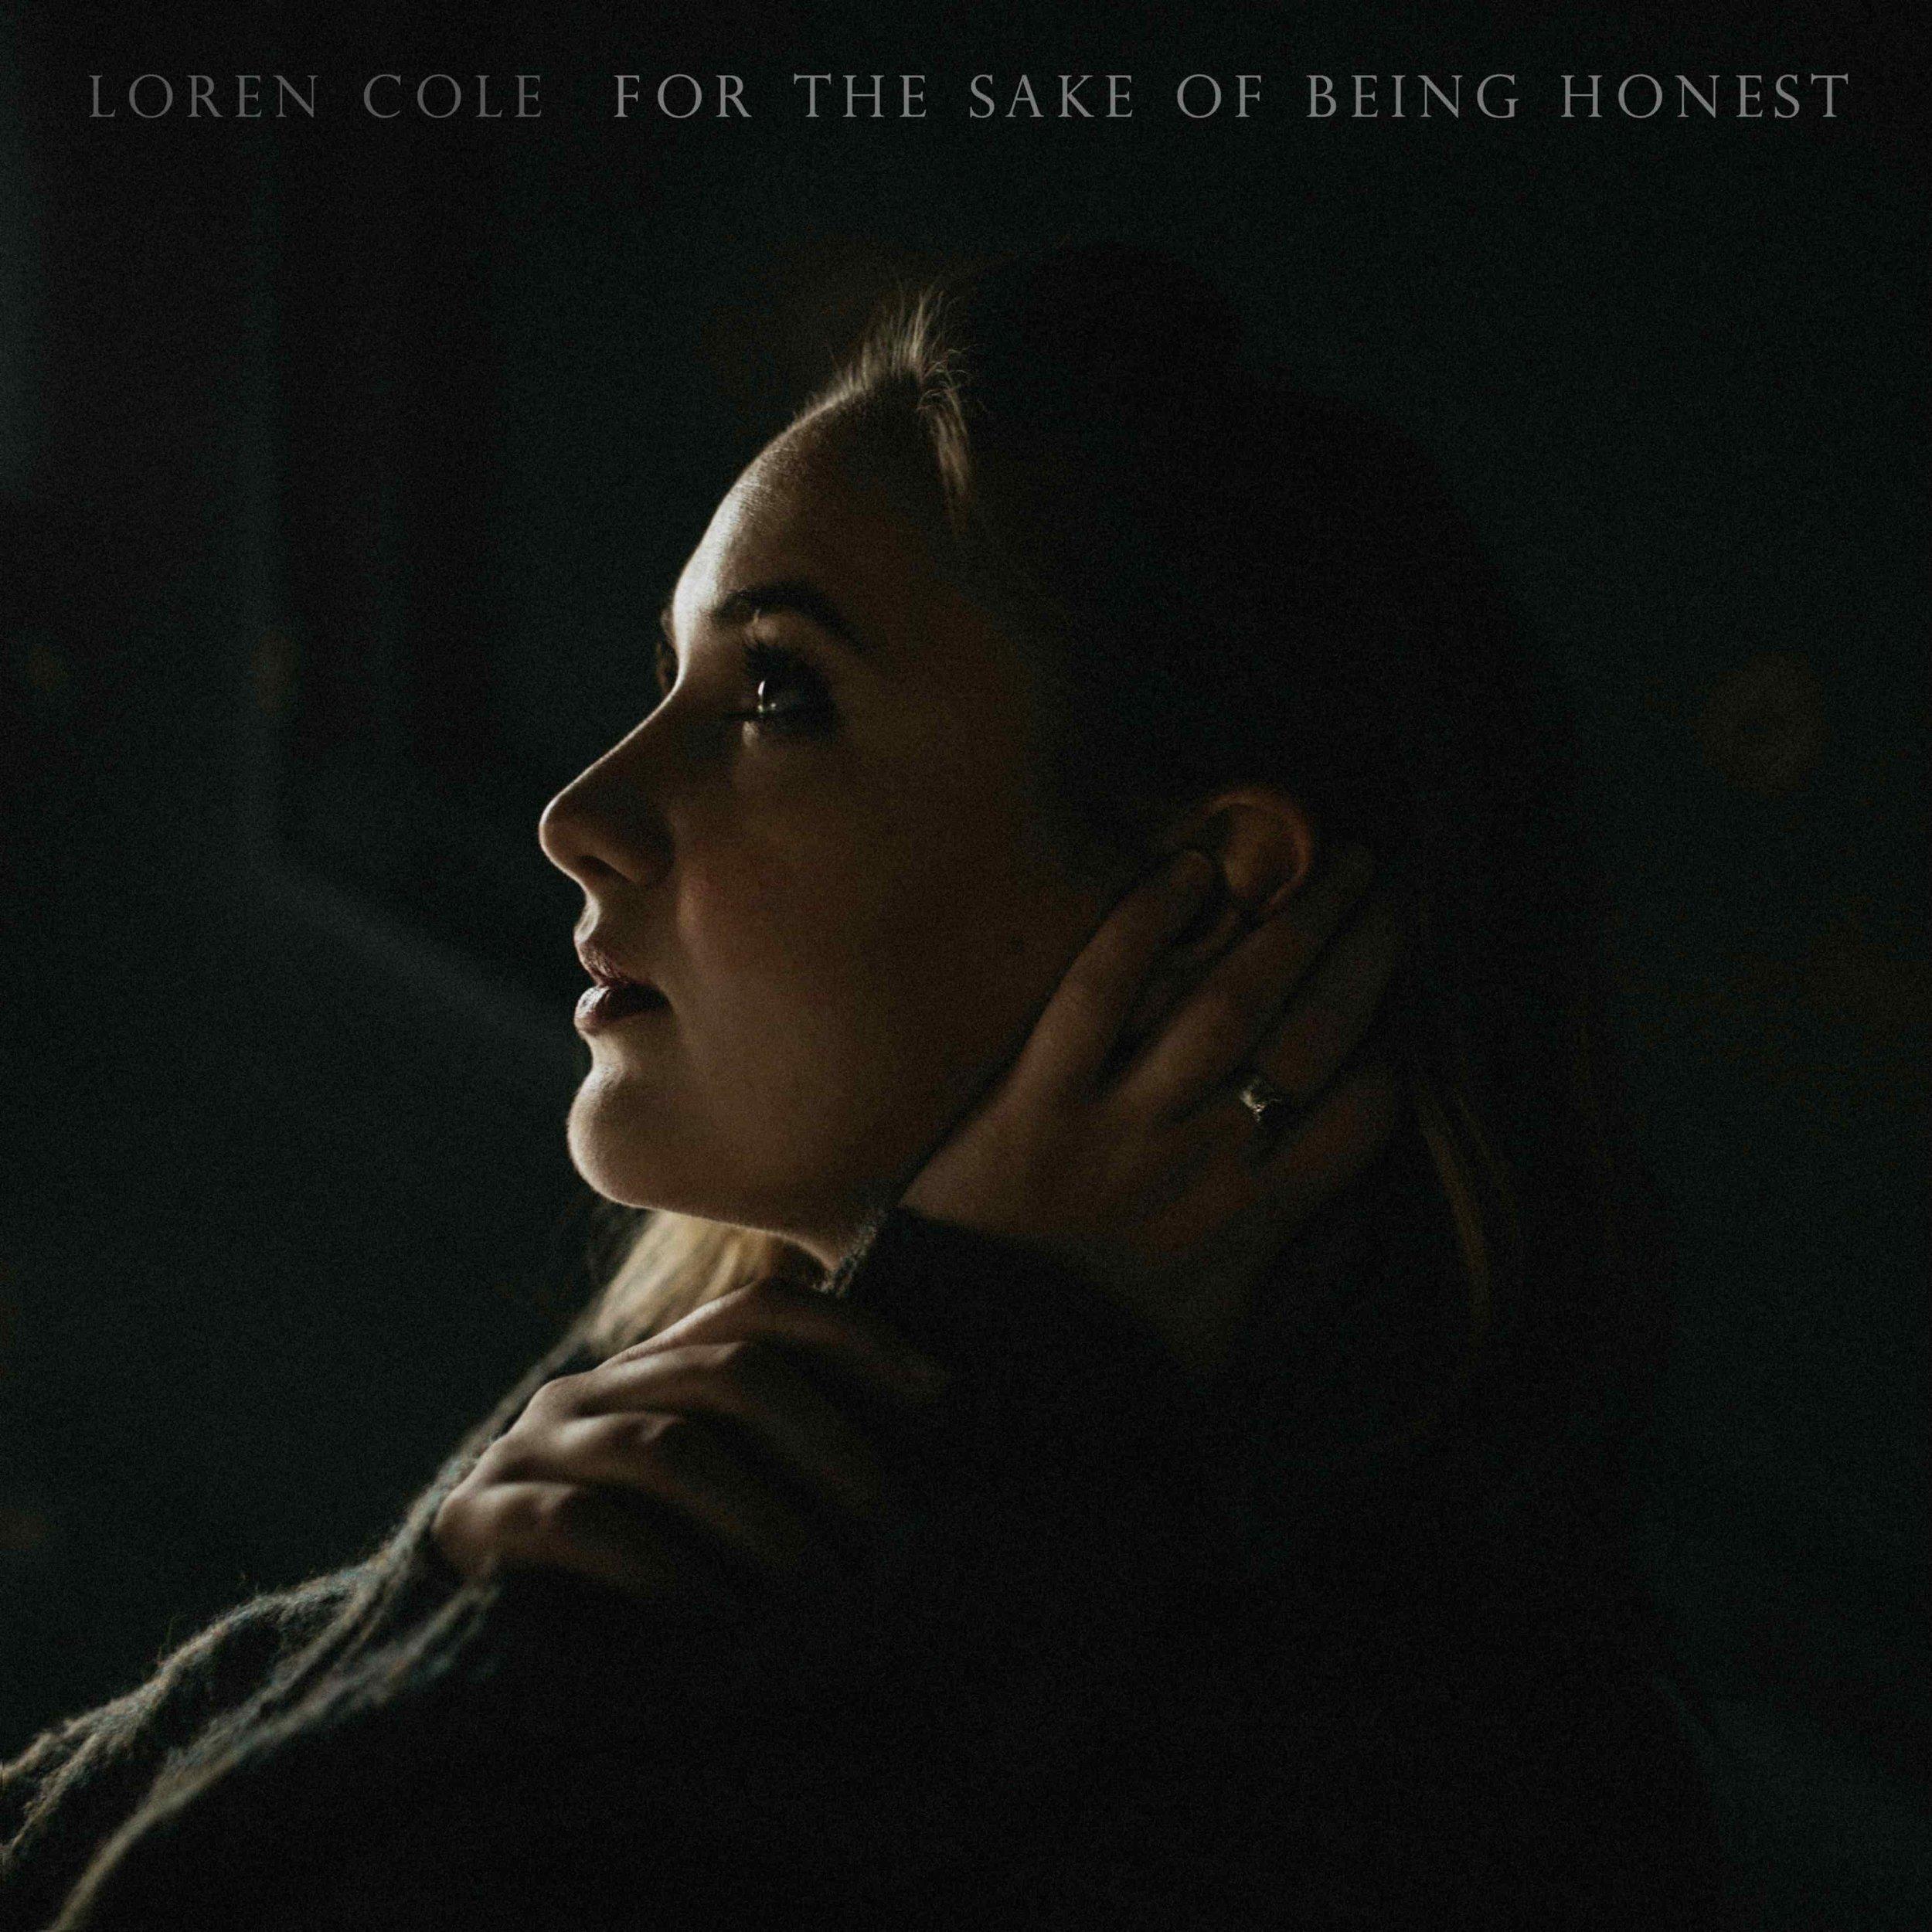 Loren Cole - For the Sake of Being Honest.jpg